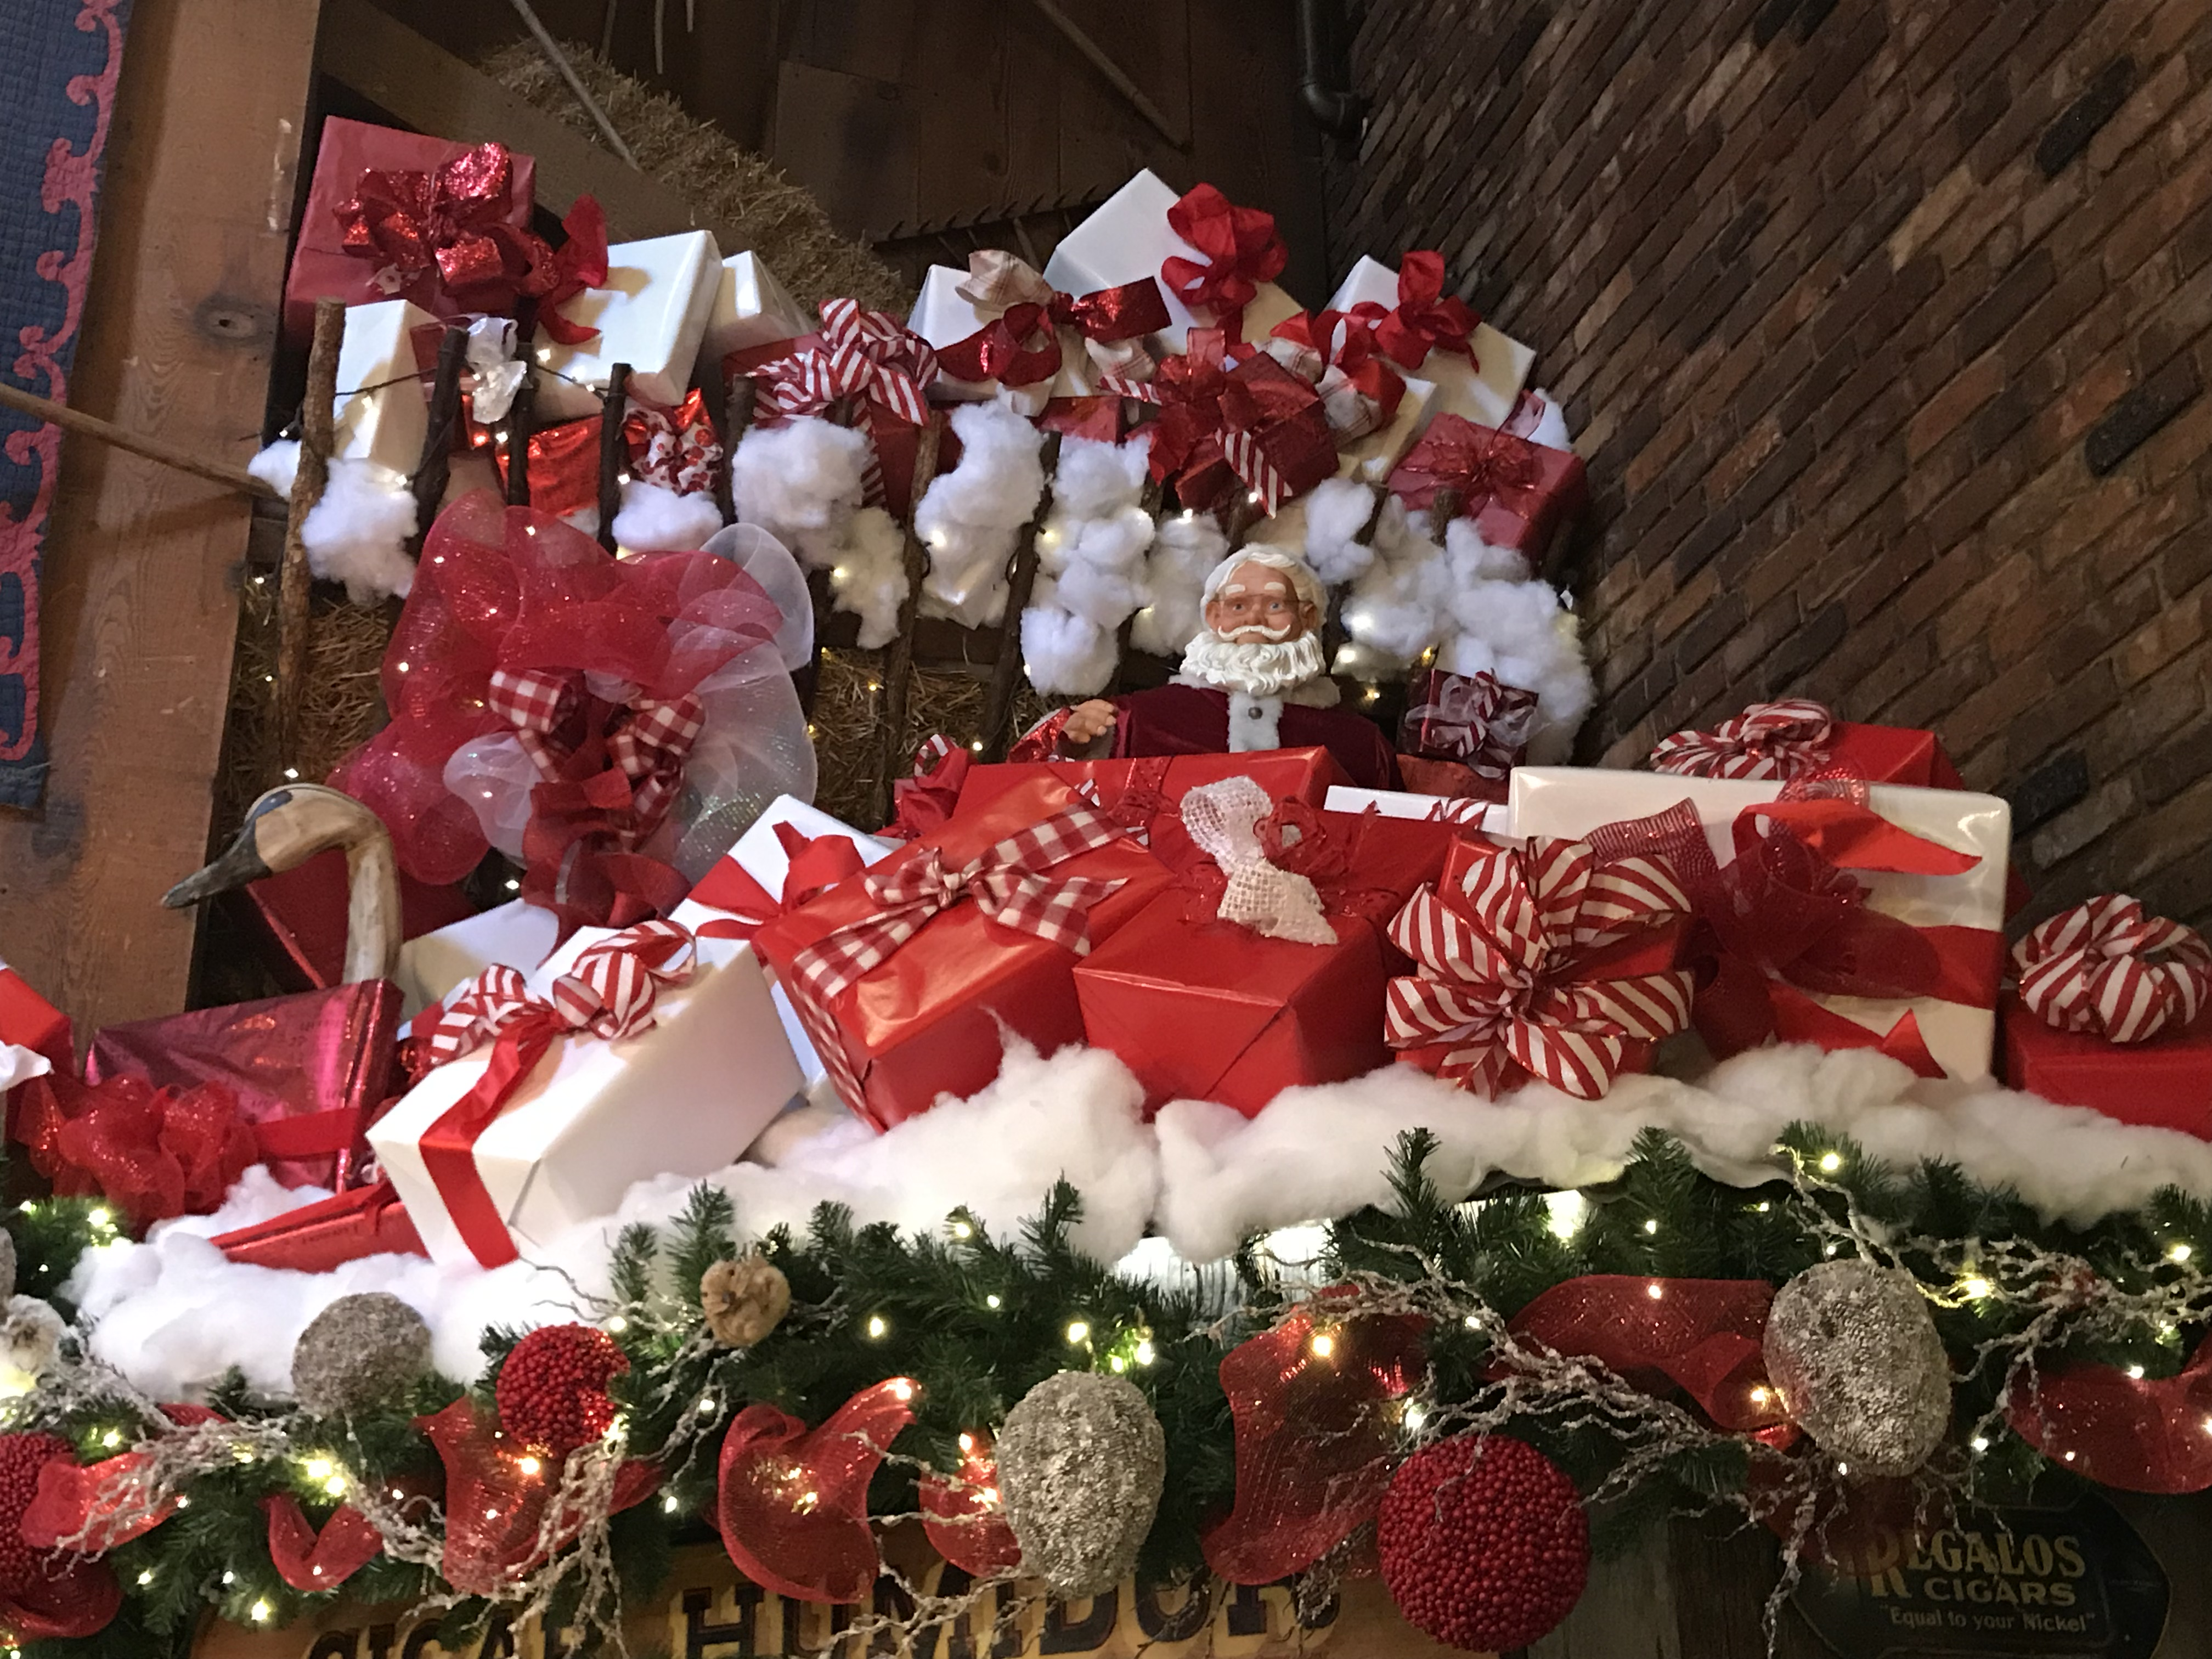 <div class='meta'><div class='origin-logo' data-origin='WTVD'></div><span class='caption-text' data-credit=''>Angus Barn is bringing in the Christmas joy</span></div>